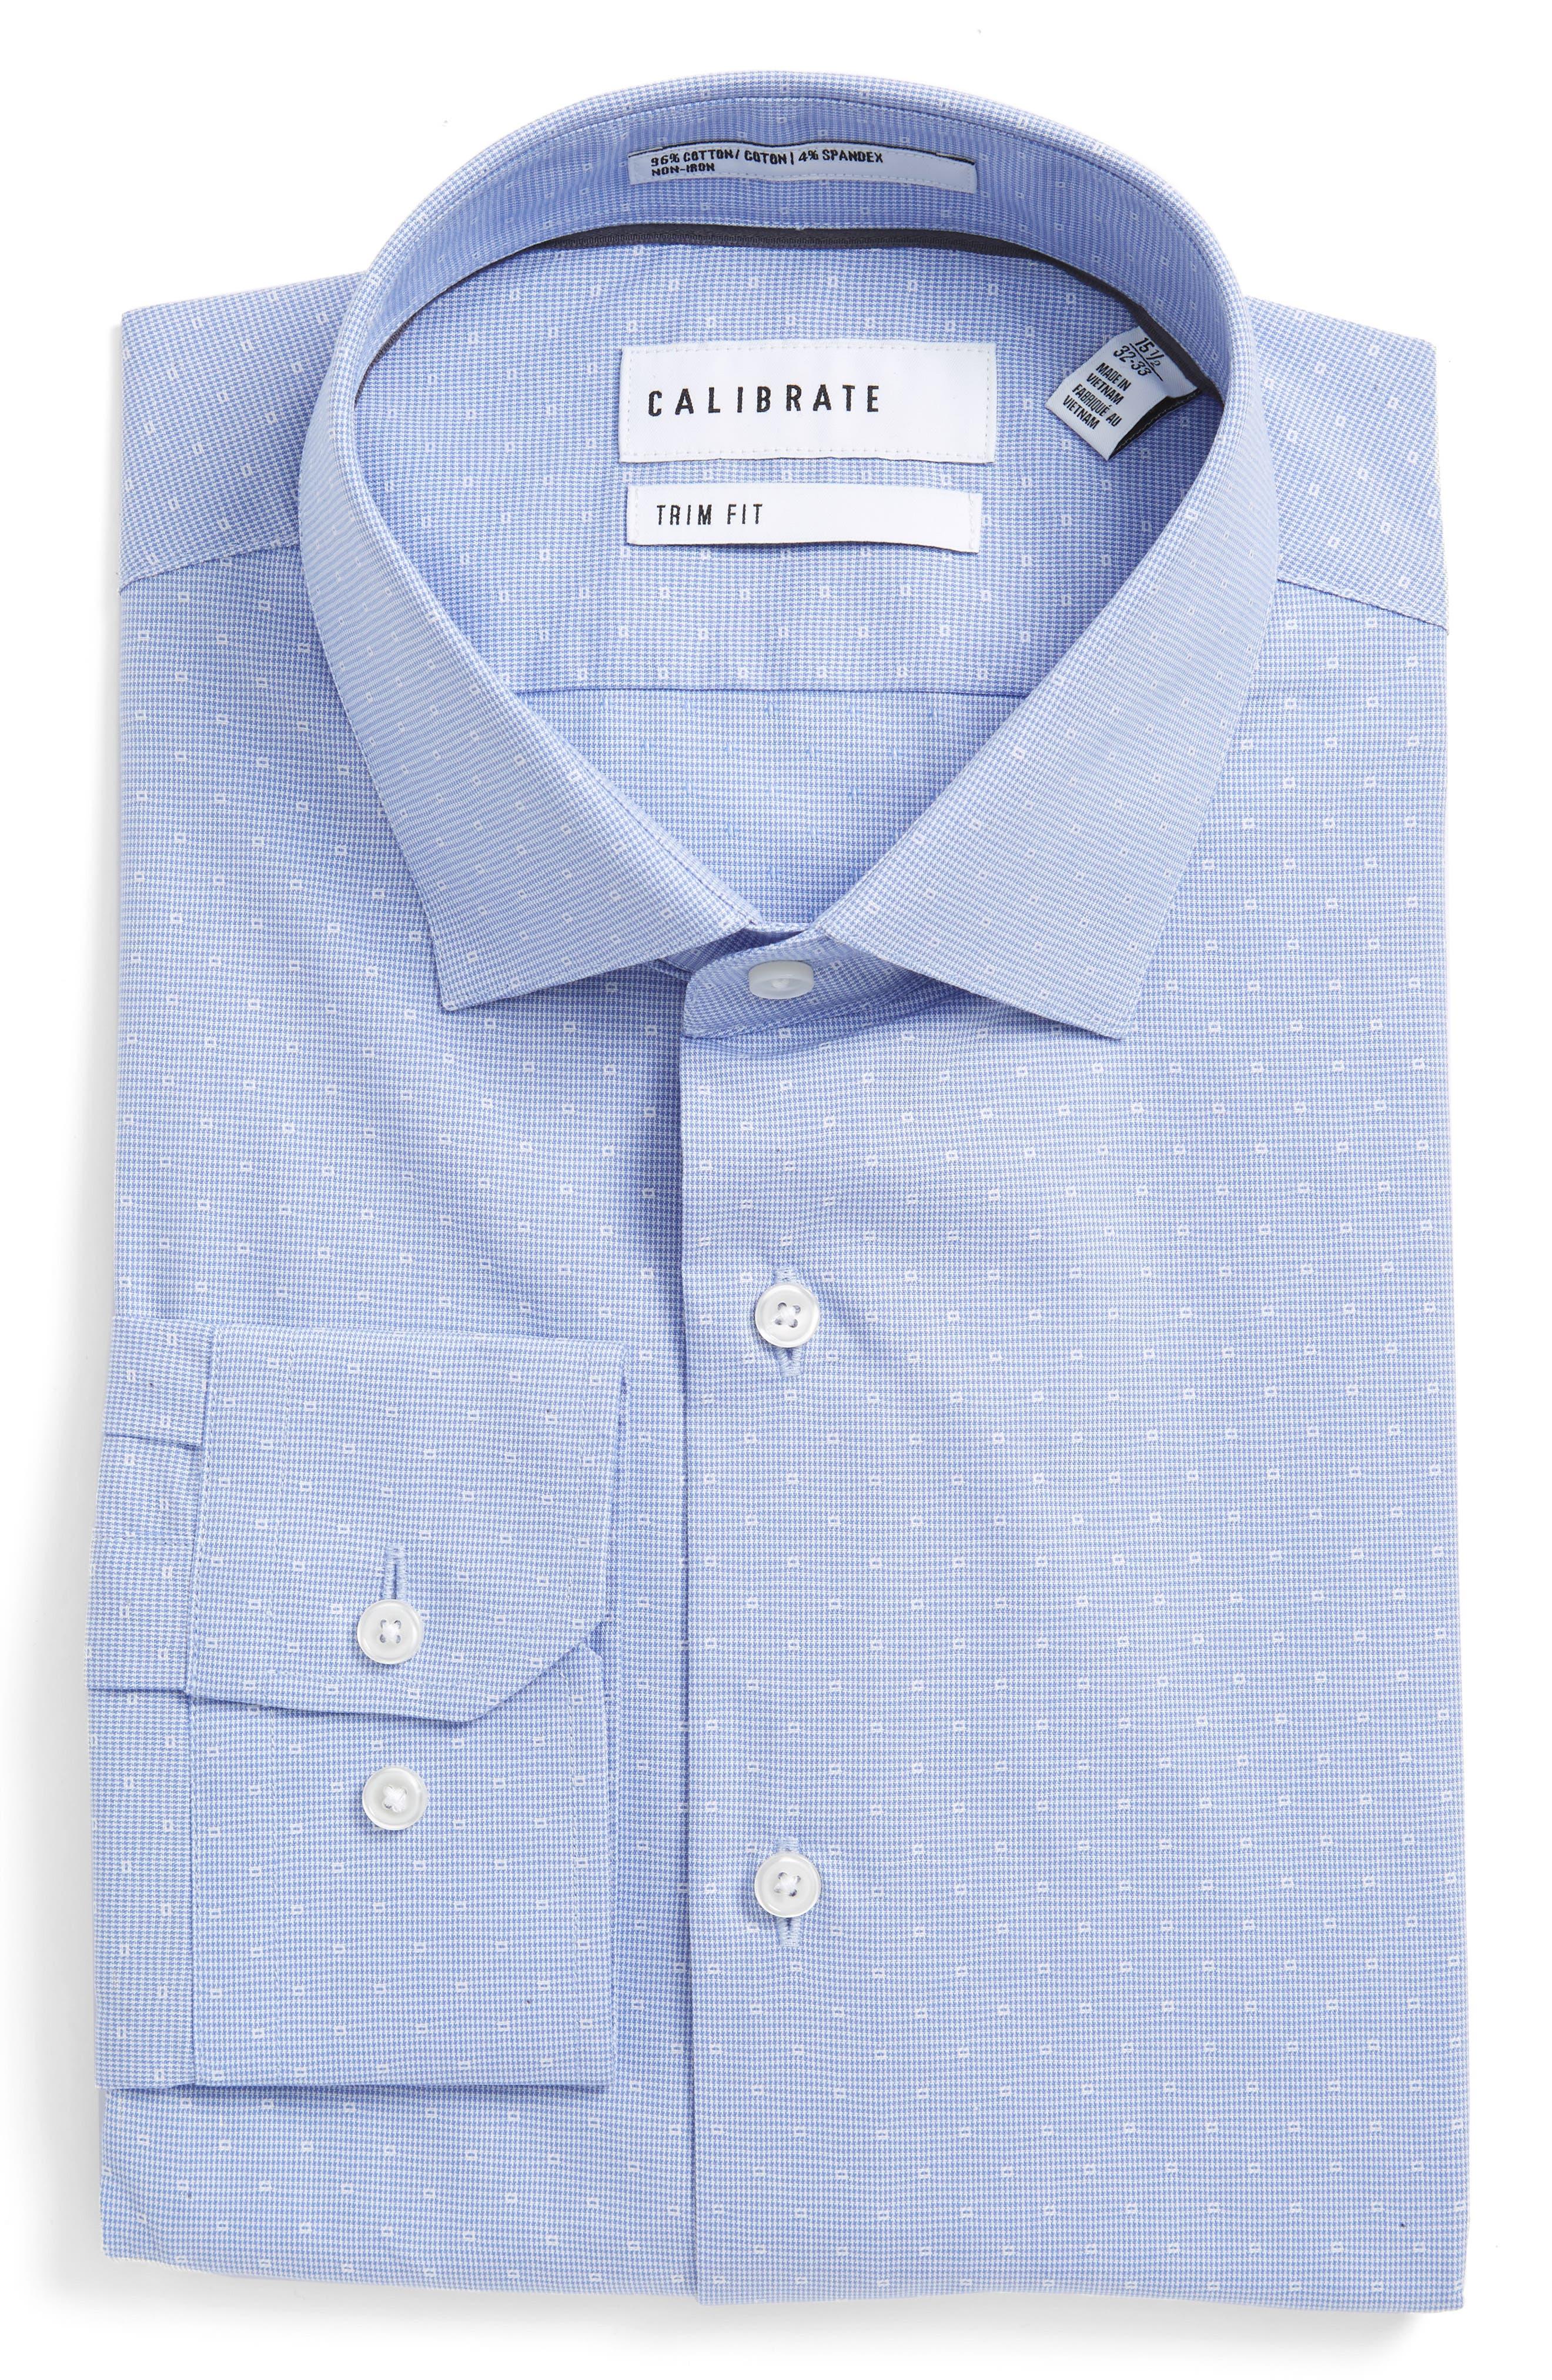 Calibrate Trim Fit Non-Iron Stretch Houndstooth Dress Shirt